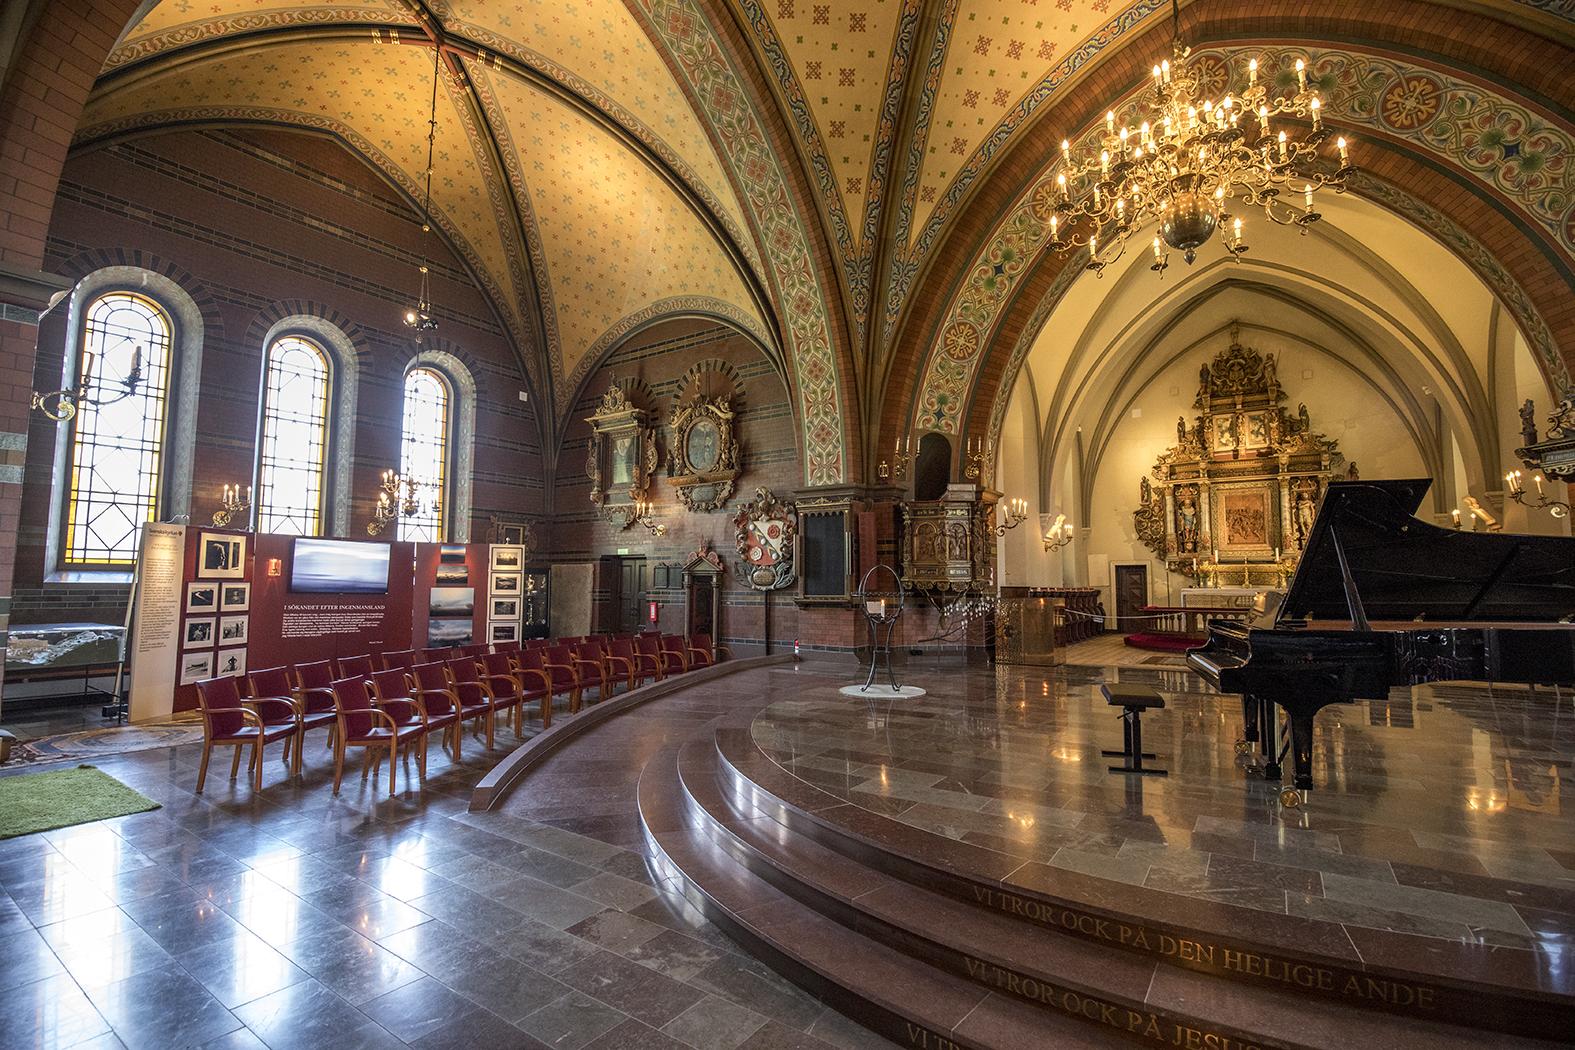 Sankt Nicolai Kyrka